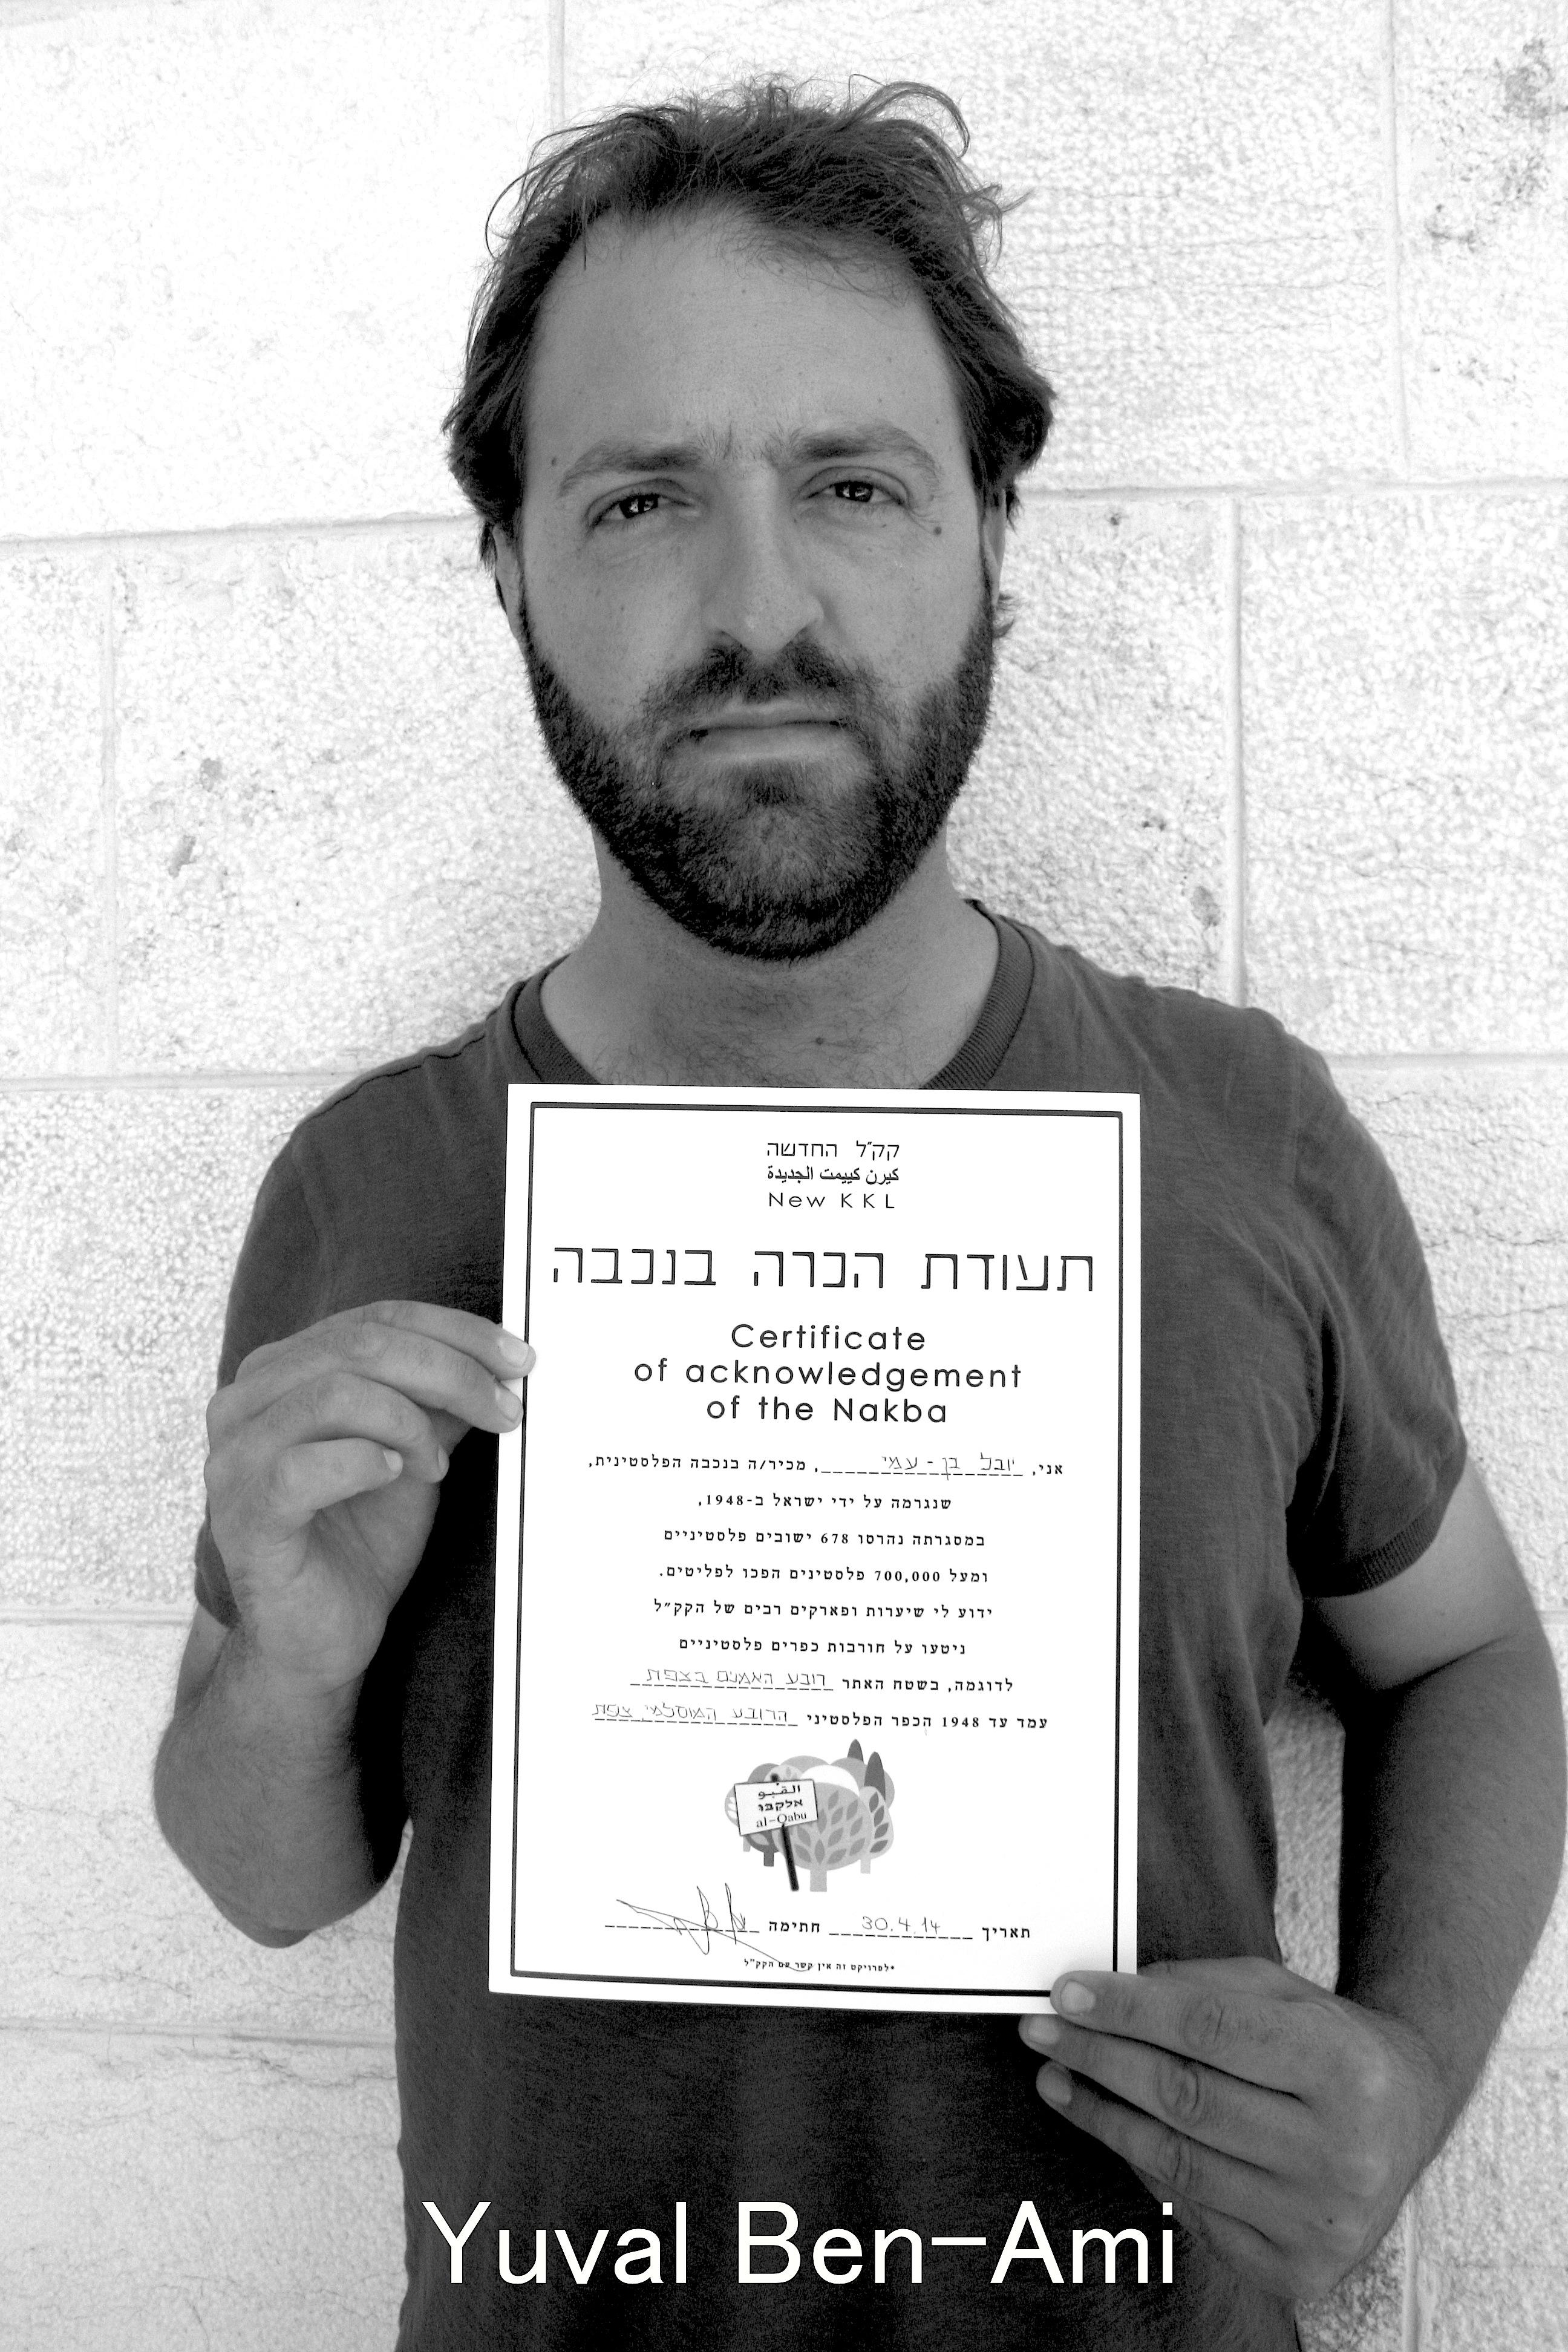 Yuval acknowledges the Nakba.